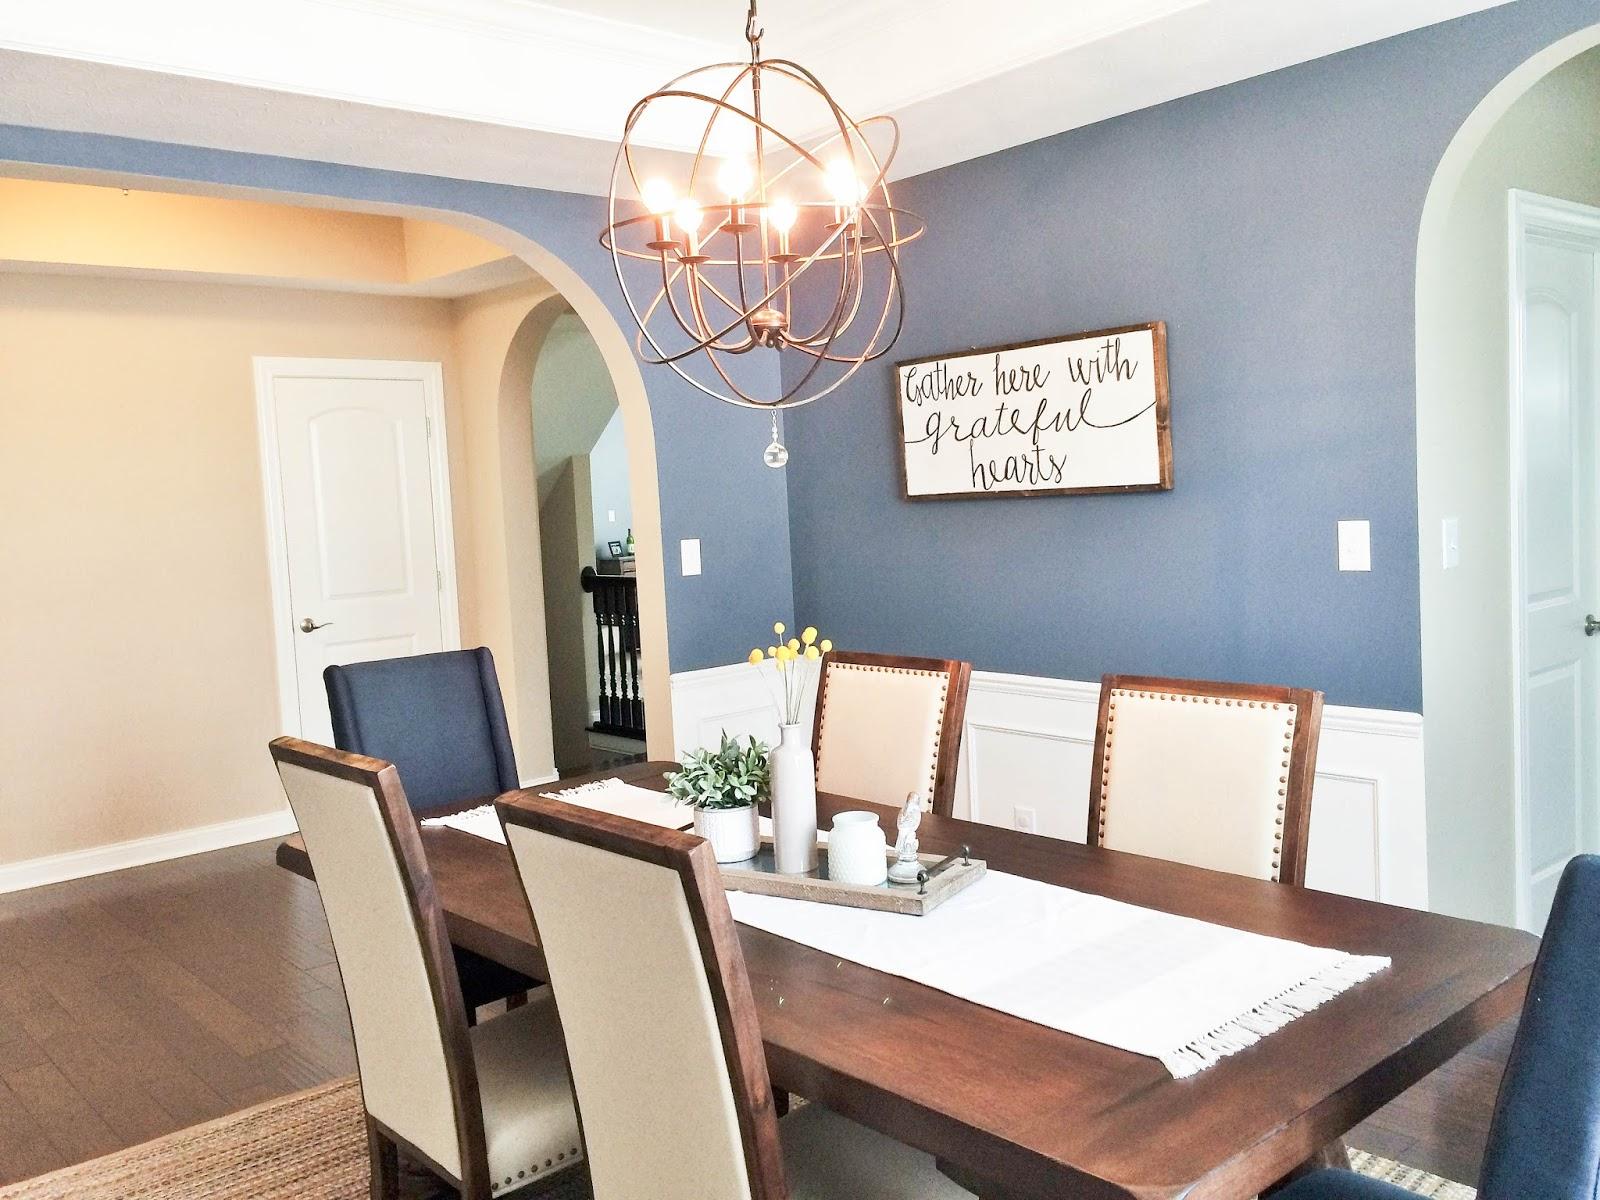 dining room client design - Orb Chandelier Dining Room